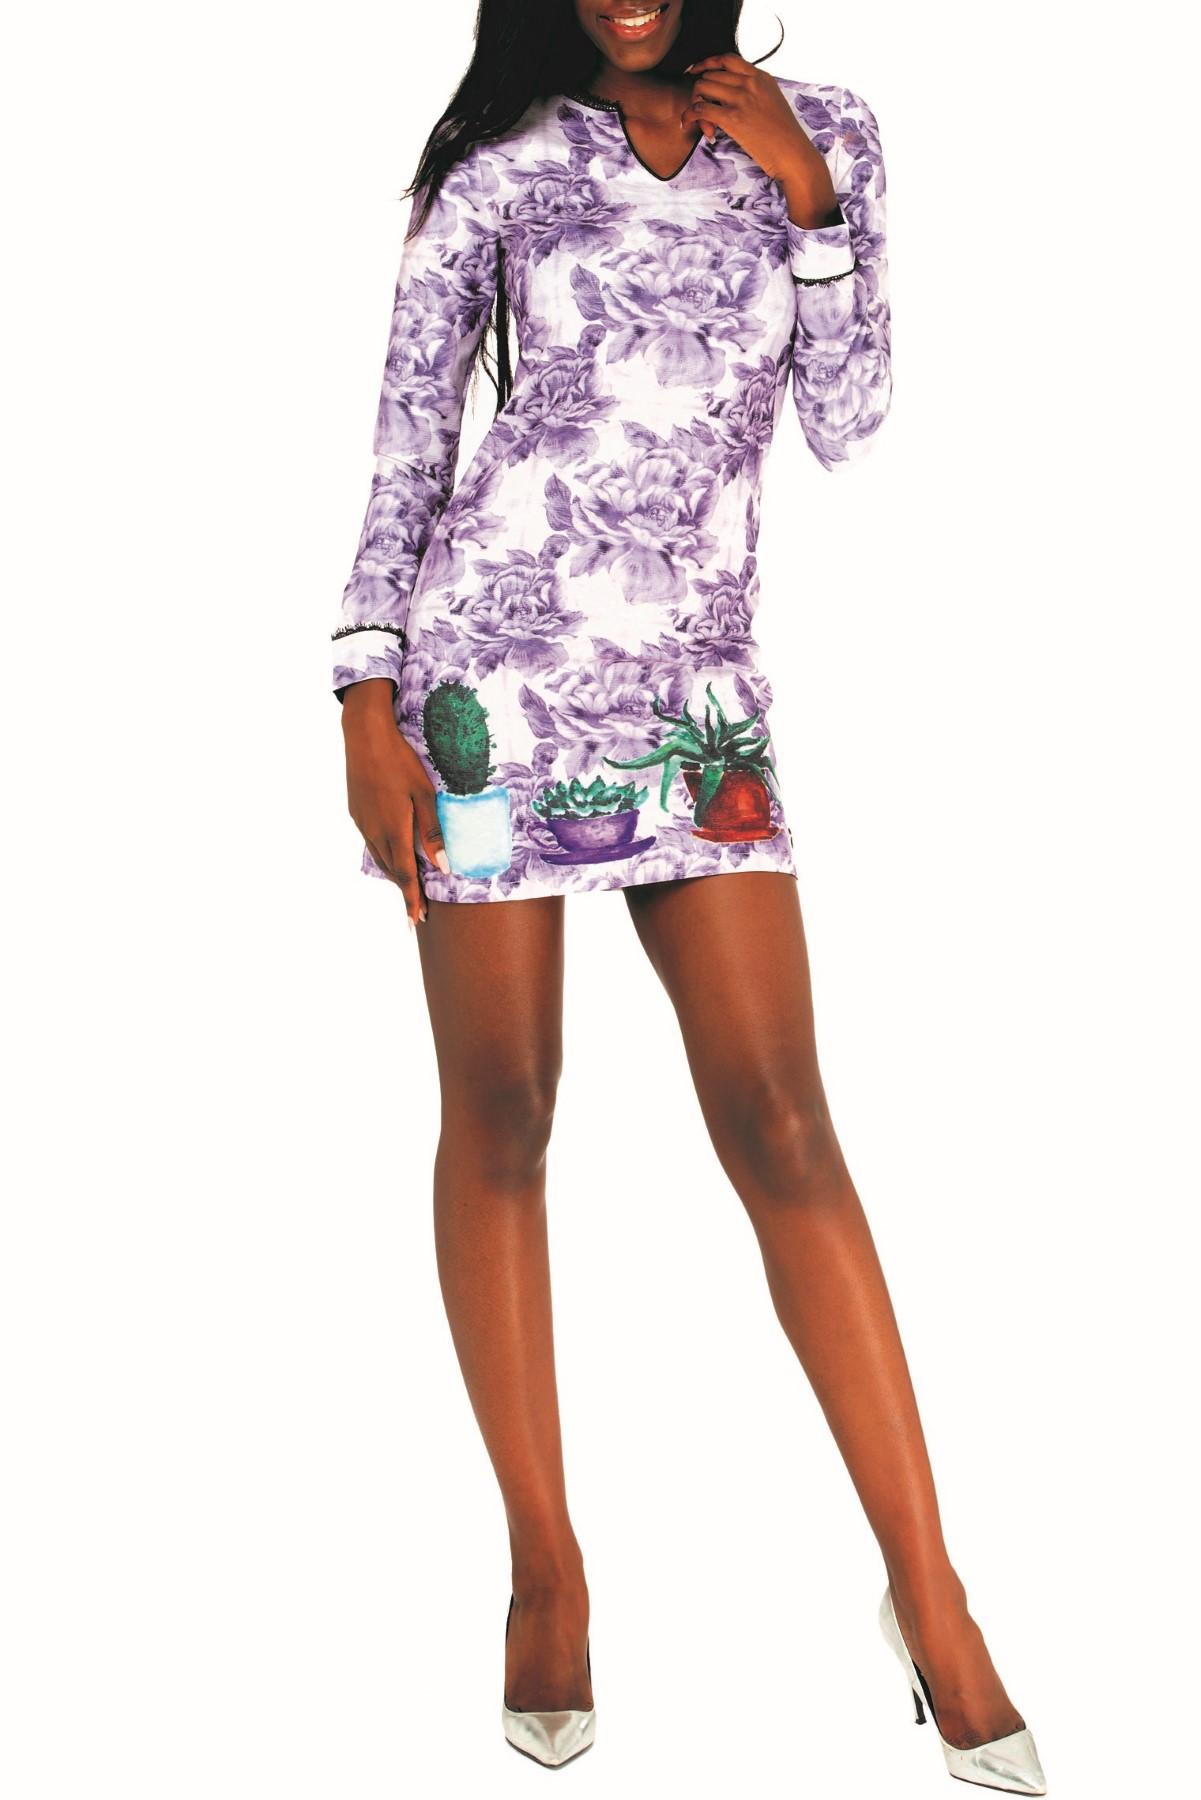 Culito from Spain barevné šaty 3 Macetas